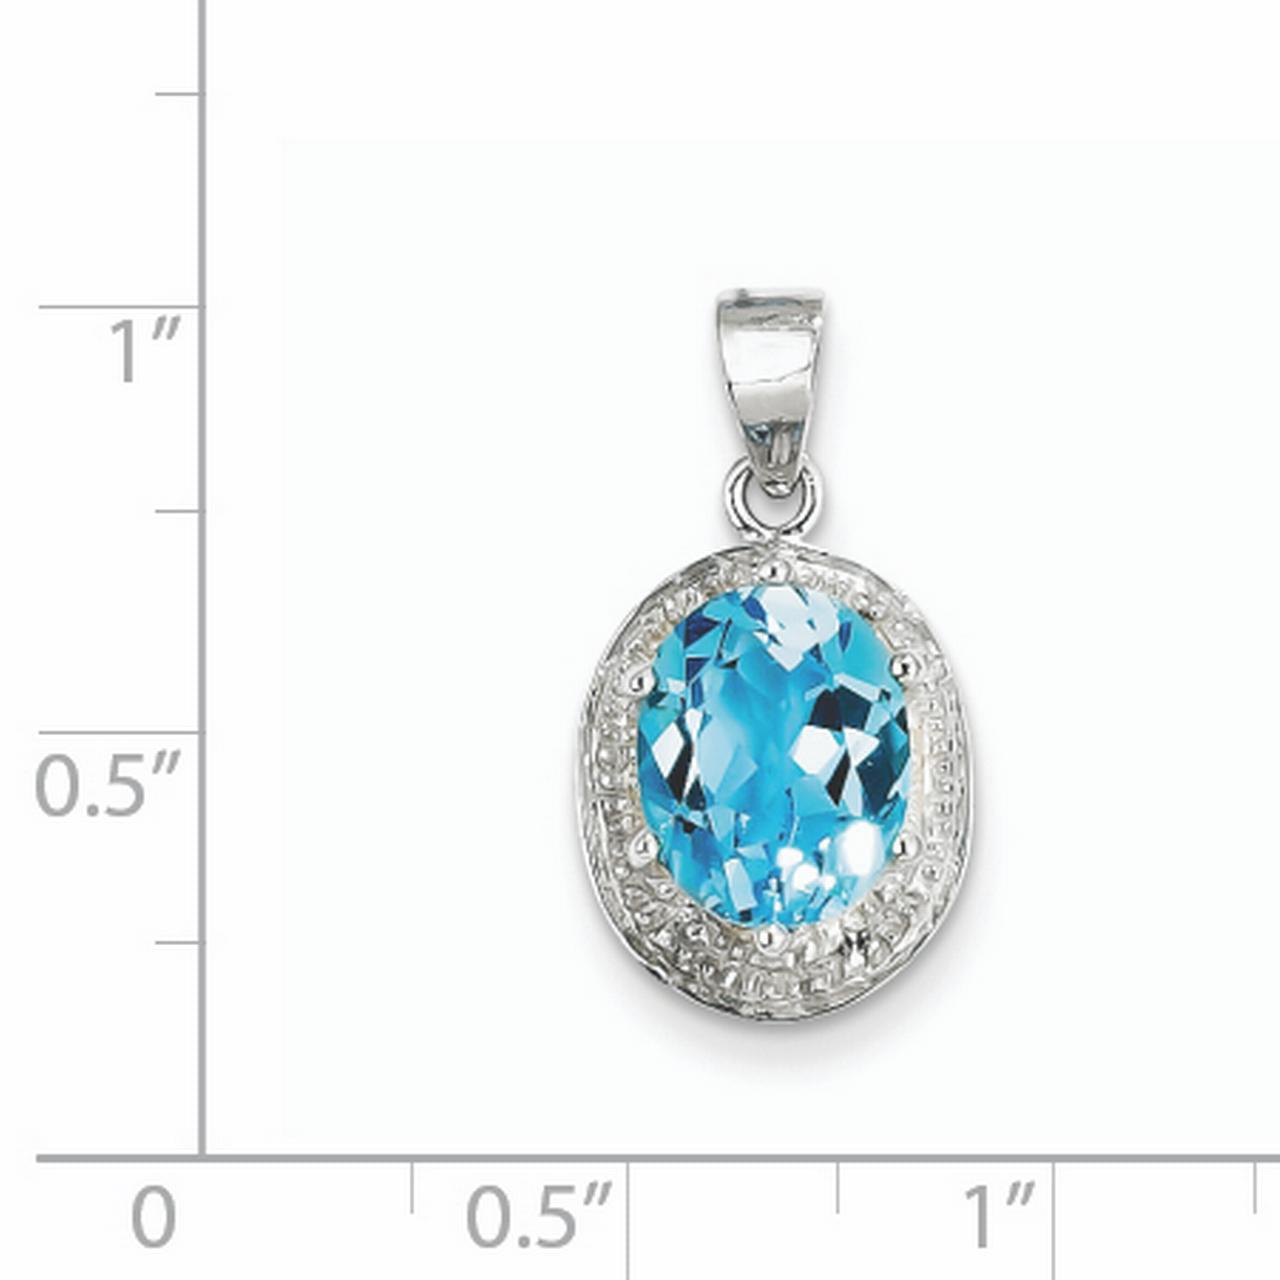 925 Sterling Silver Rhodium Light Swiss Blue Topaz and Diamond Oval Shaped Pendant - image 1 de 2